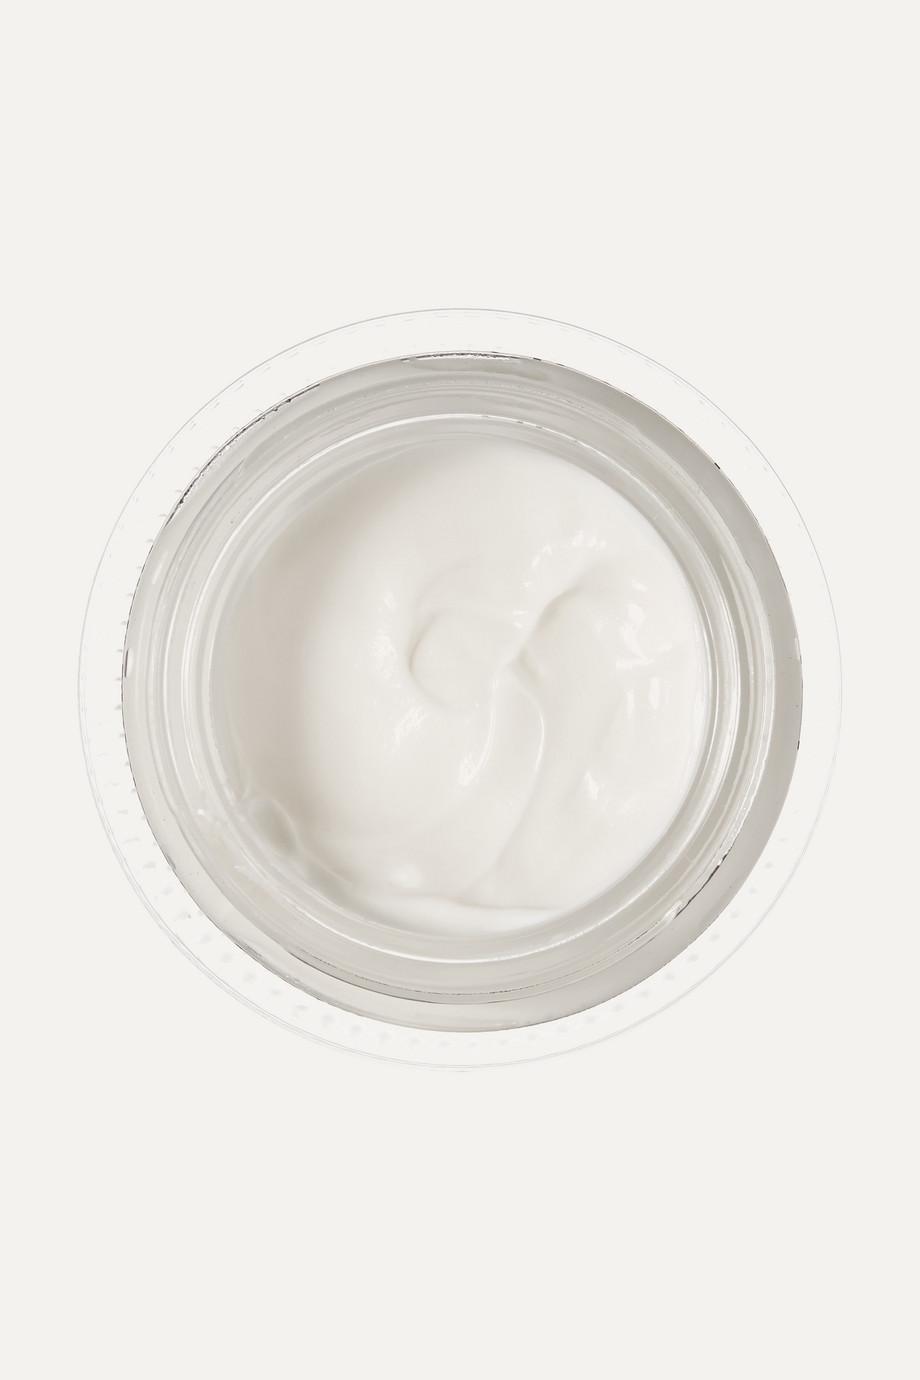 Dr Sebagh High Maintenance Cream, 50 ml - Feuchtigkeitscreme